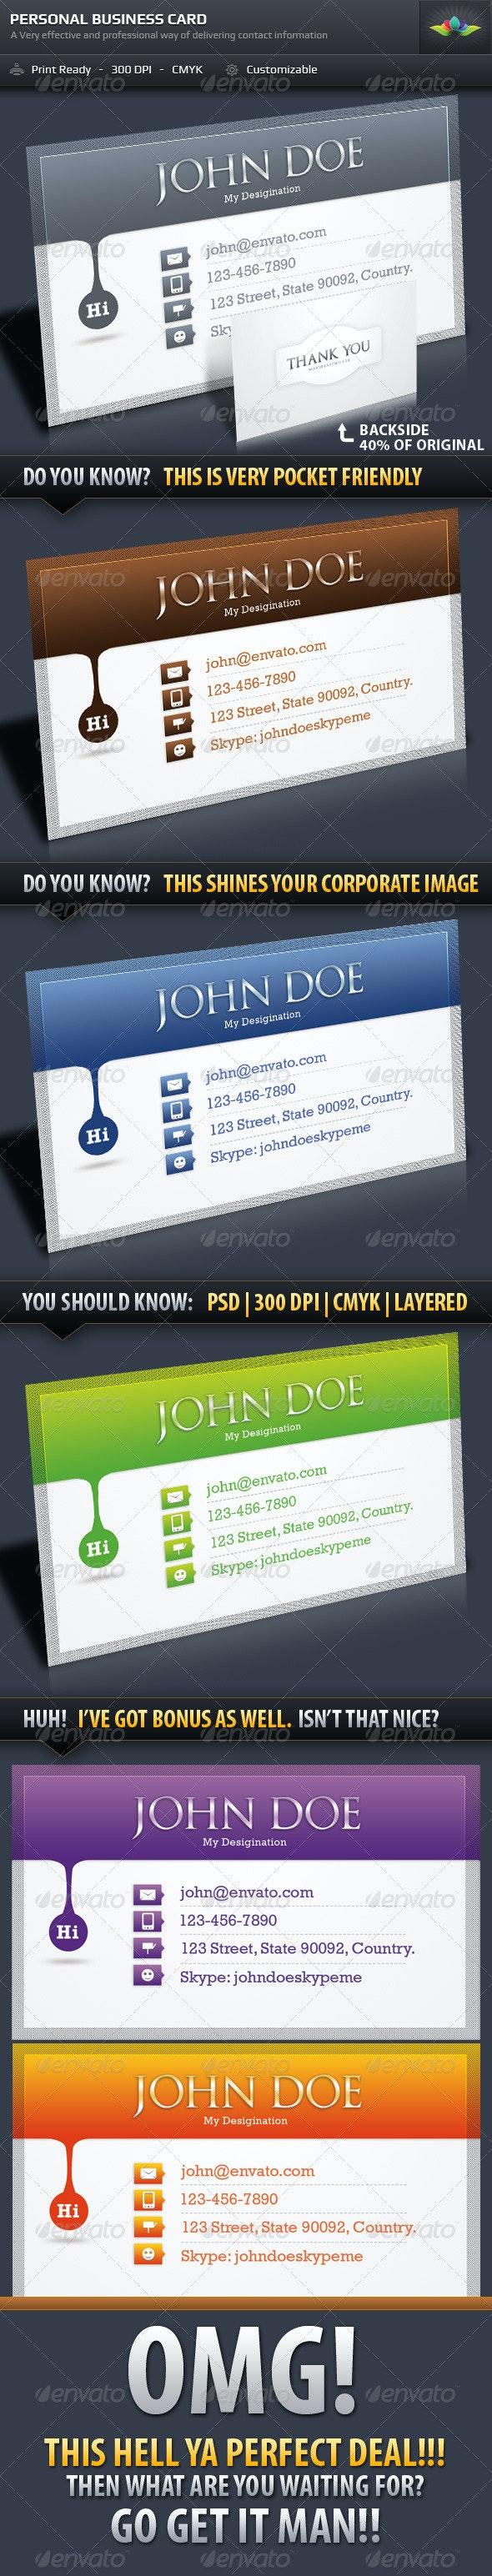 Personal Business Card Design By Saptarang  - Corporate Business Cards